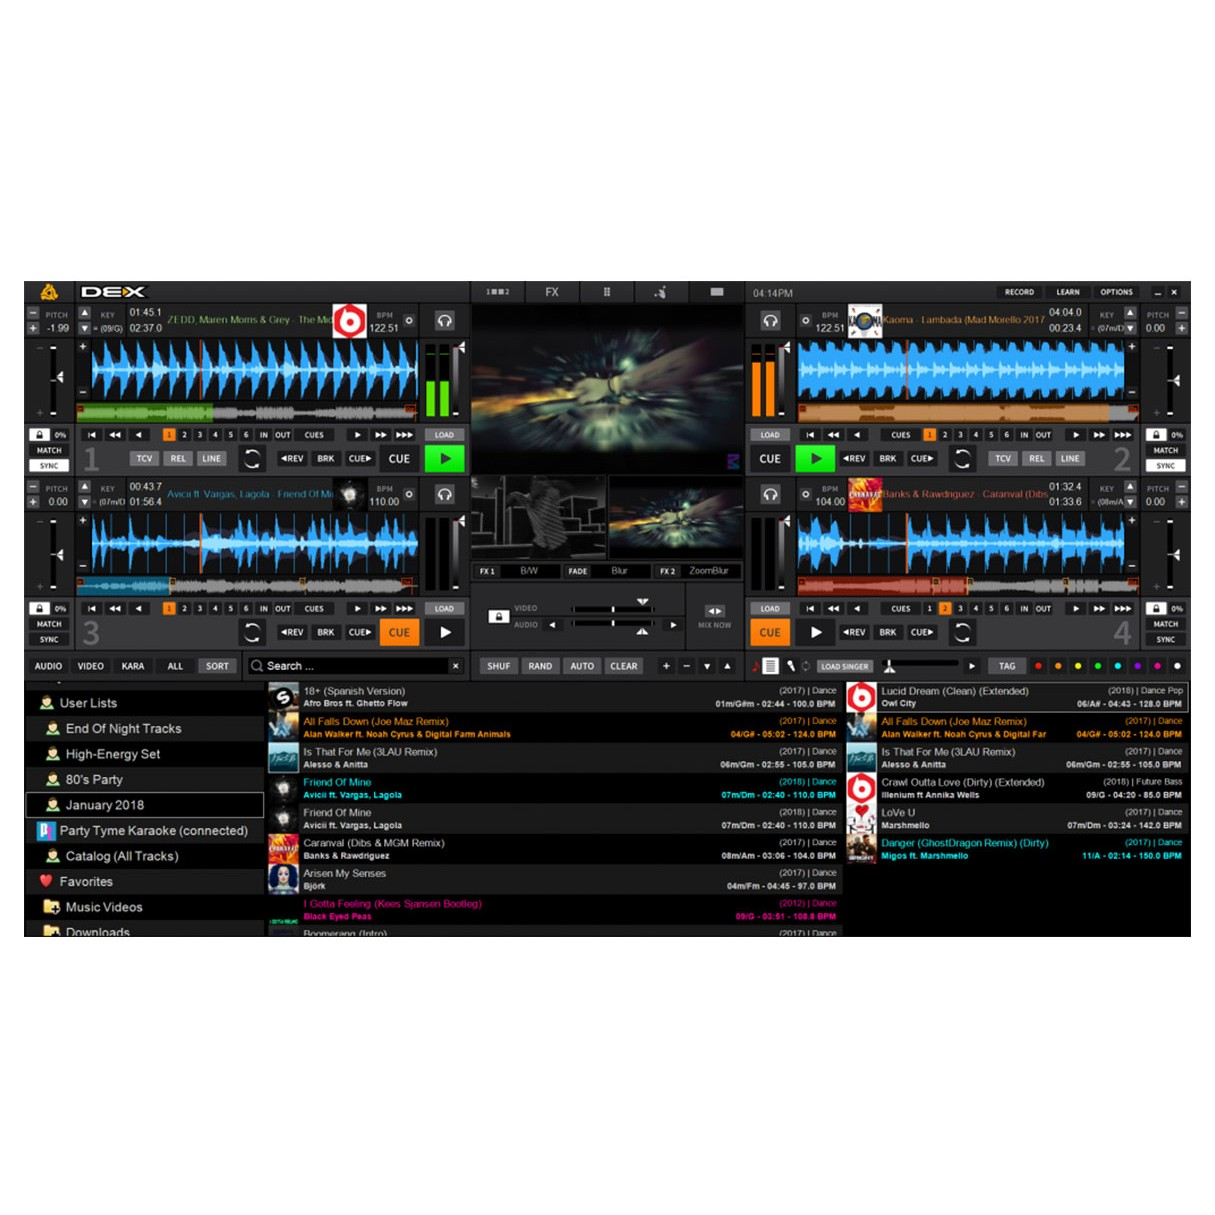 PCDJ DEX 3 DJ Software: Mix Audio, Video & Karaoke (Instant